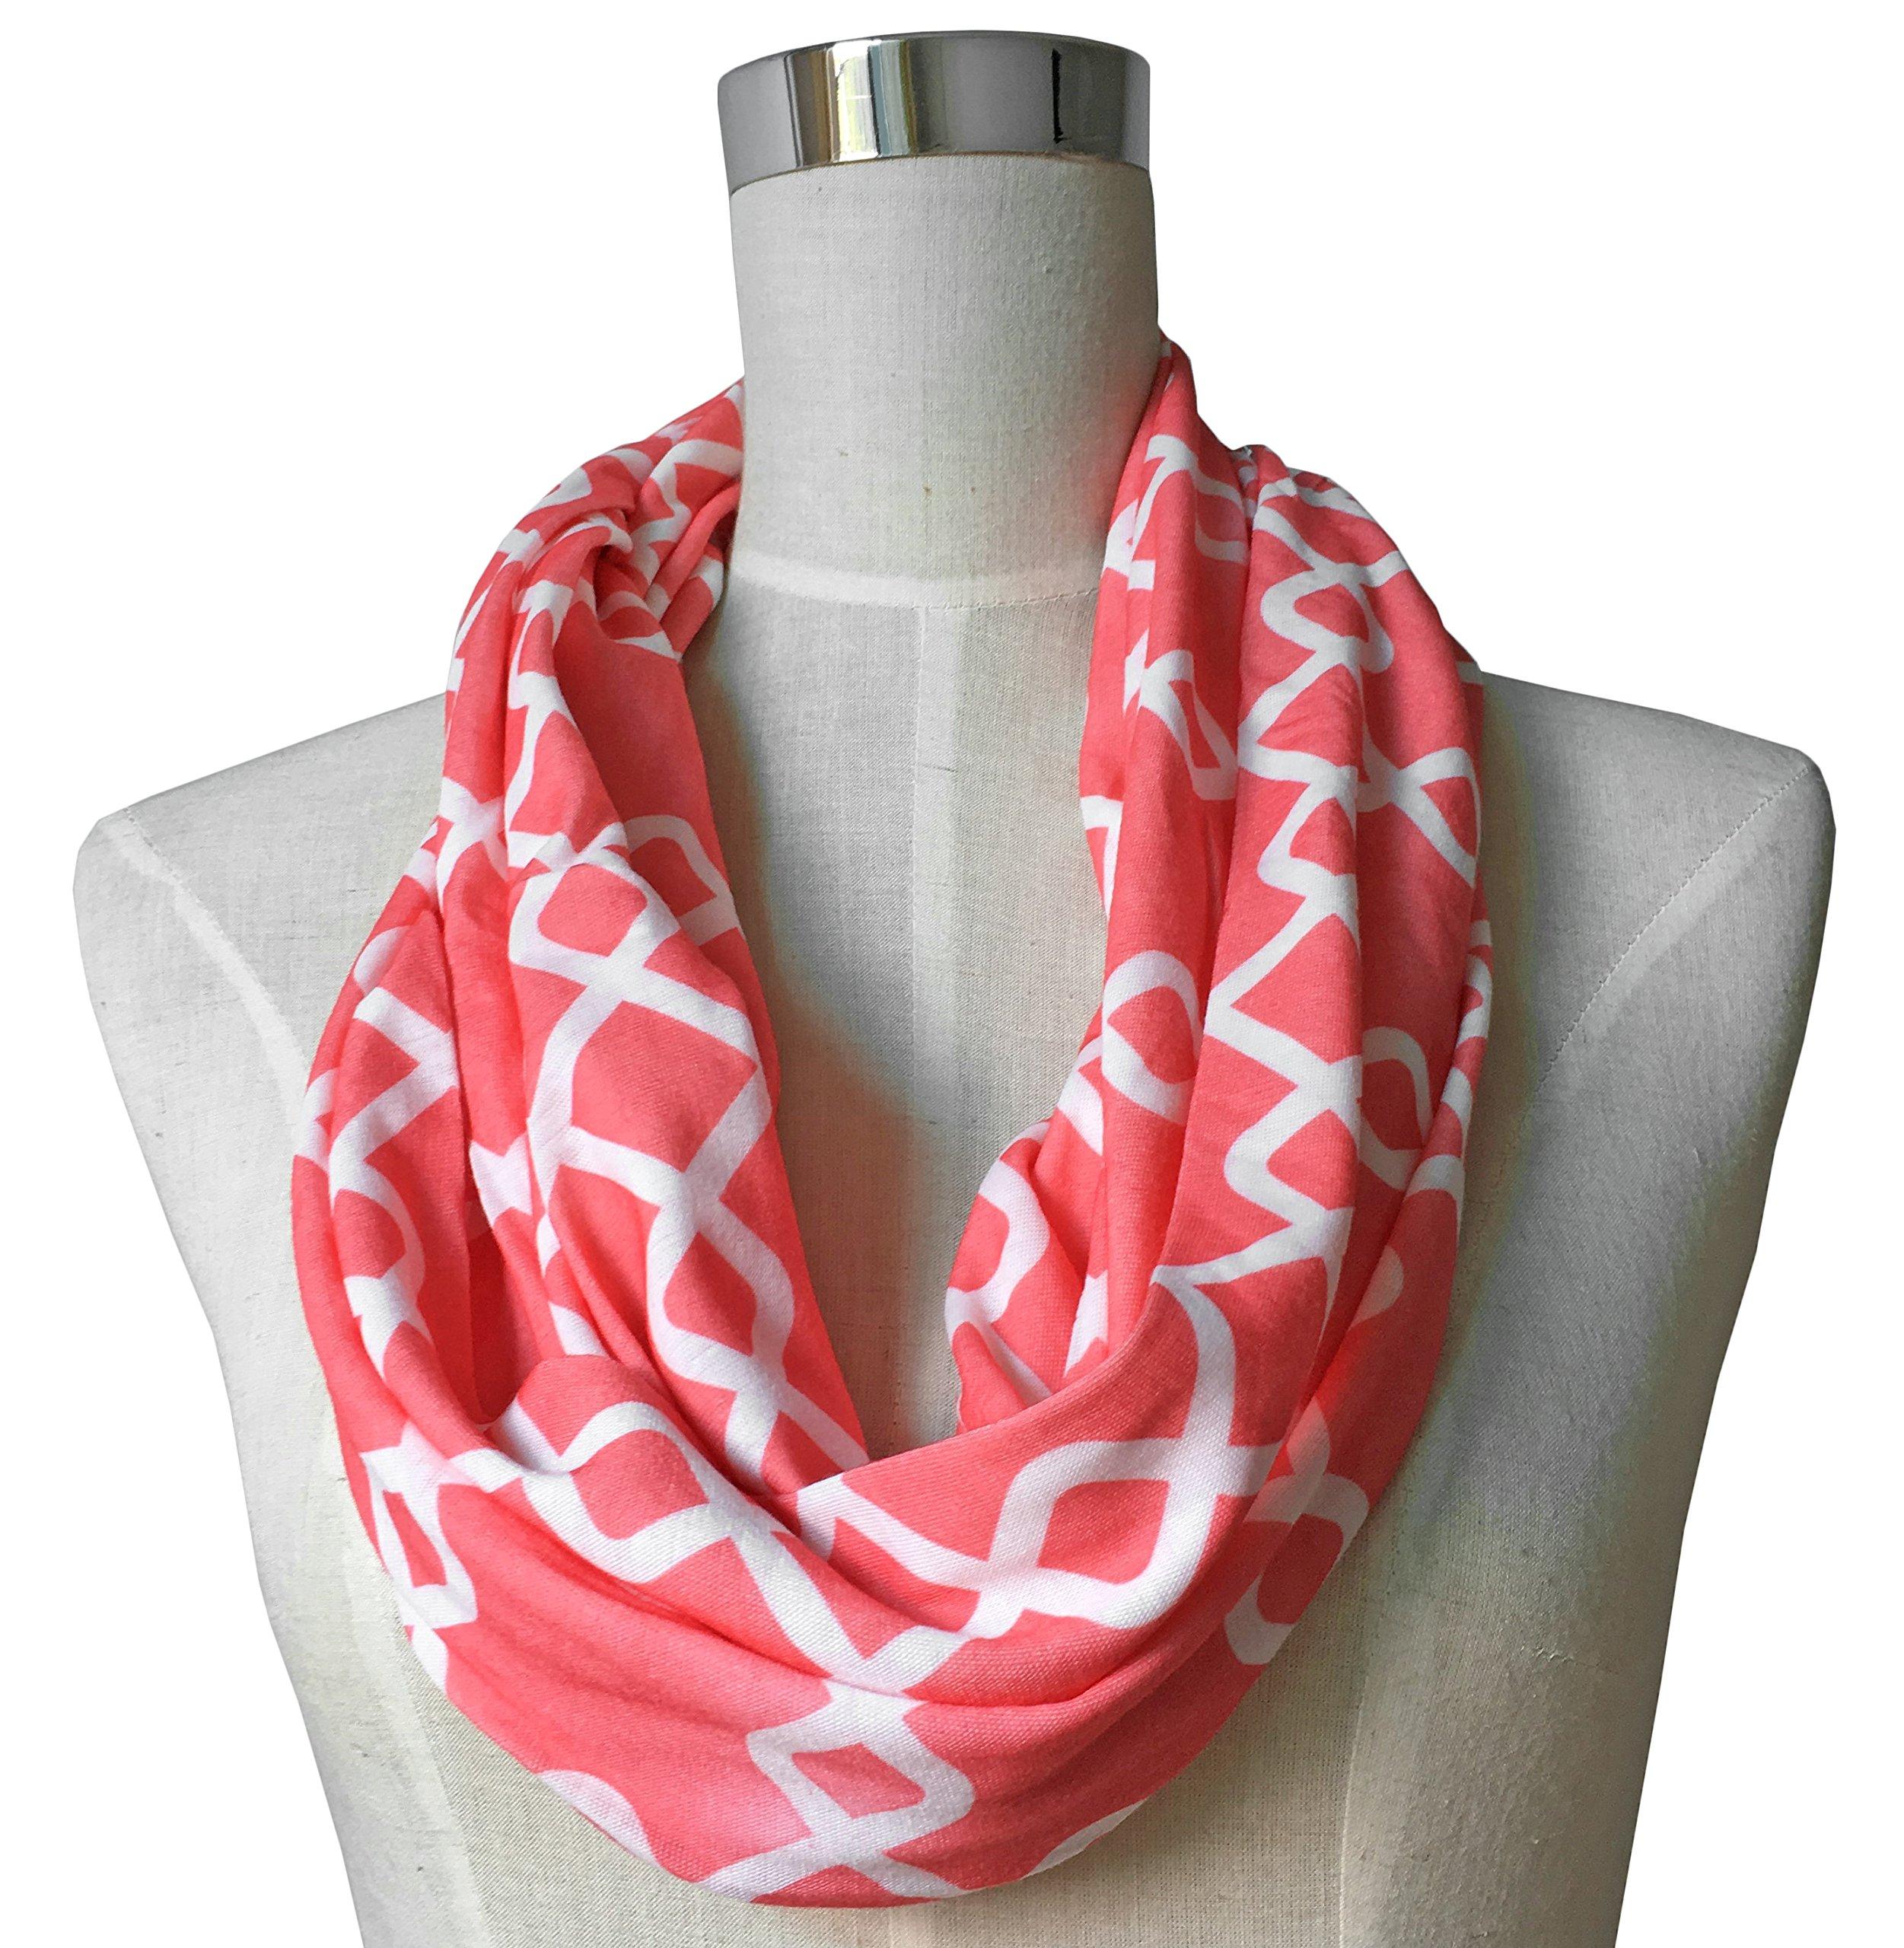 Womens Interlocking Chain Square Pattern Scarf w/Zipper Pocket - Pop Fashion (Coral)